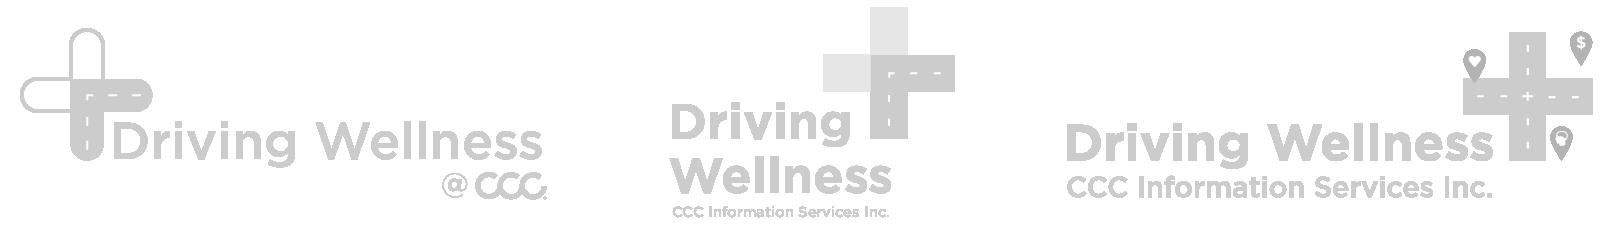 dw-logos-variations-04.png